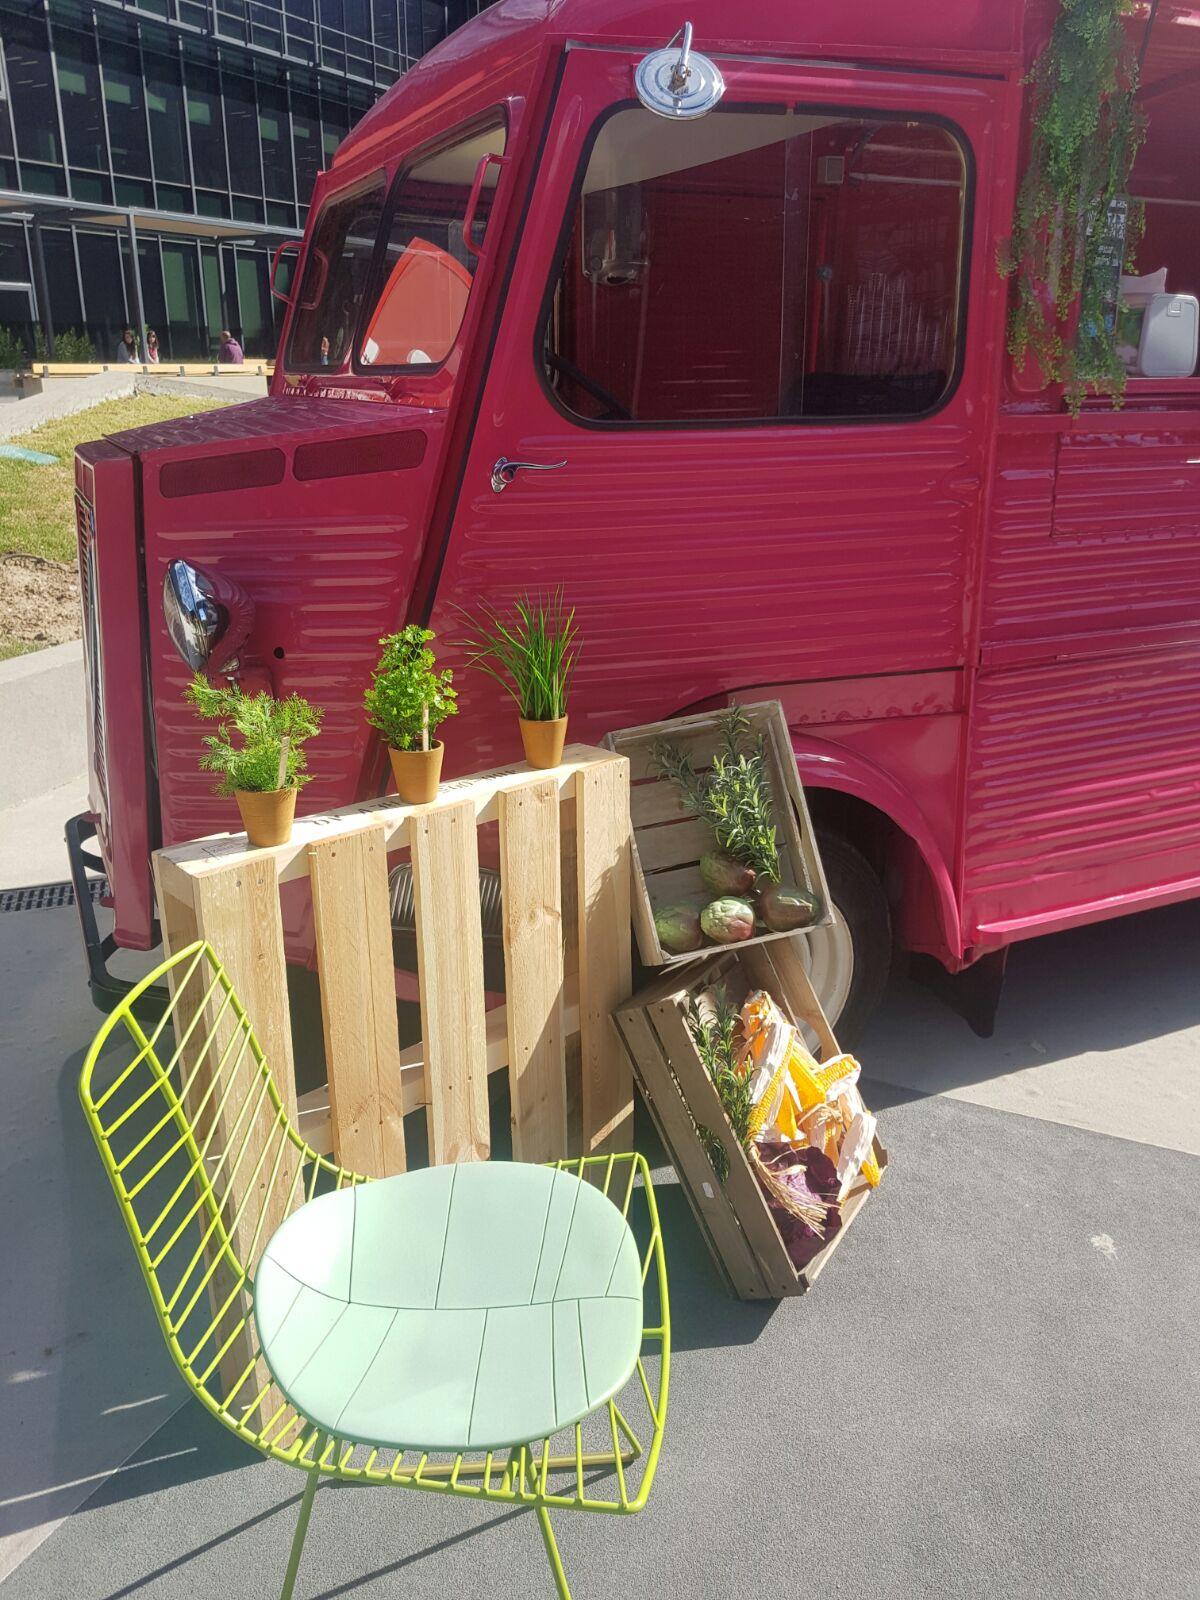 Los Food Trucks de Mediterránea viajan hasta Vodafone